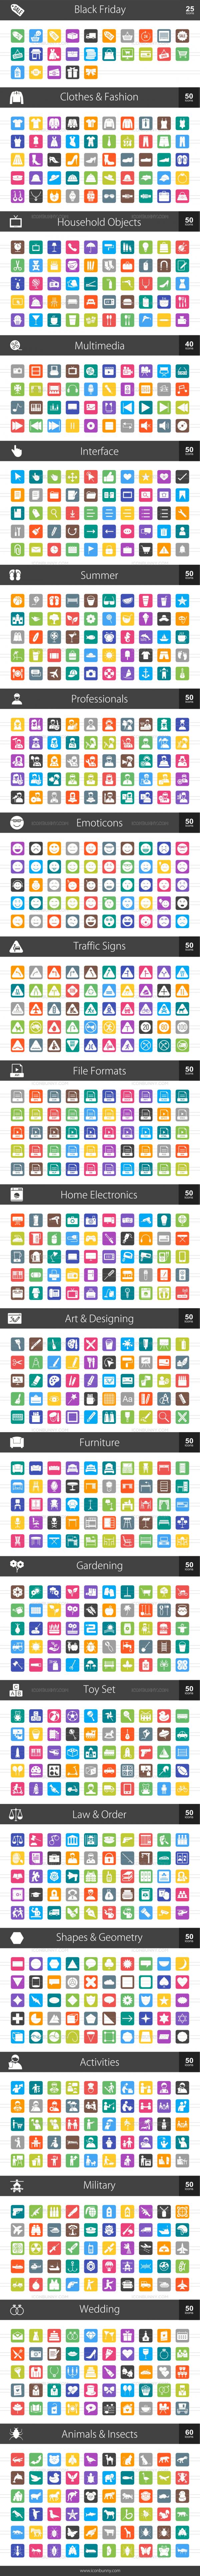 1025 Flat Round Corner Icons Bundle - Preview - IconBunny